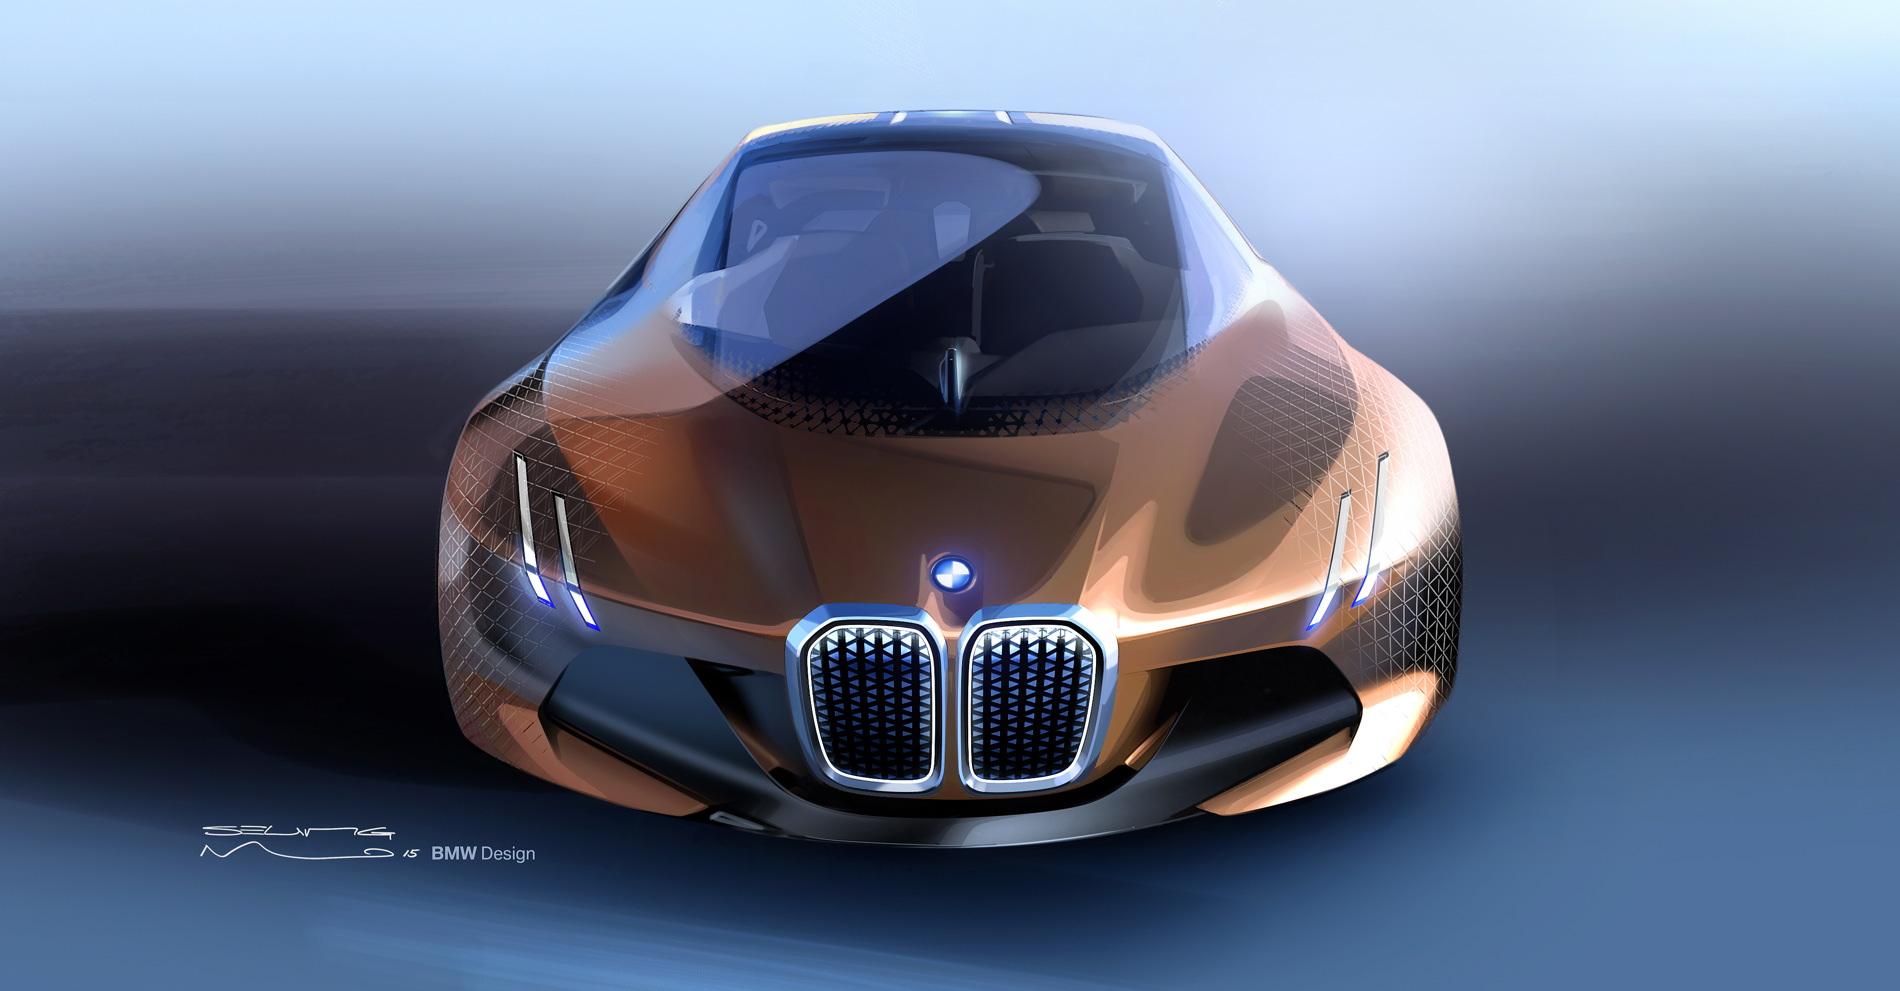 BMW VISION NEXT 100 images 12